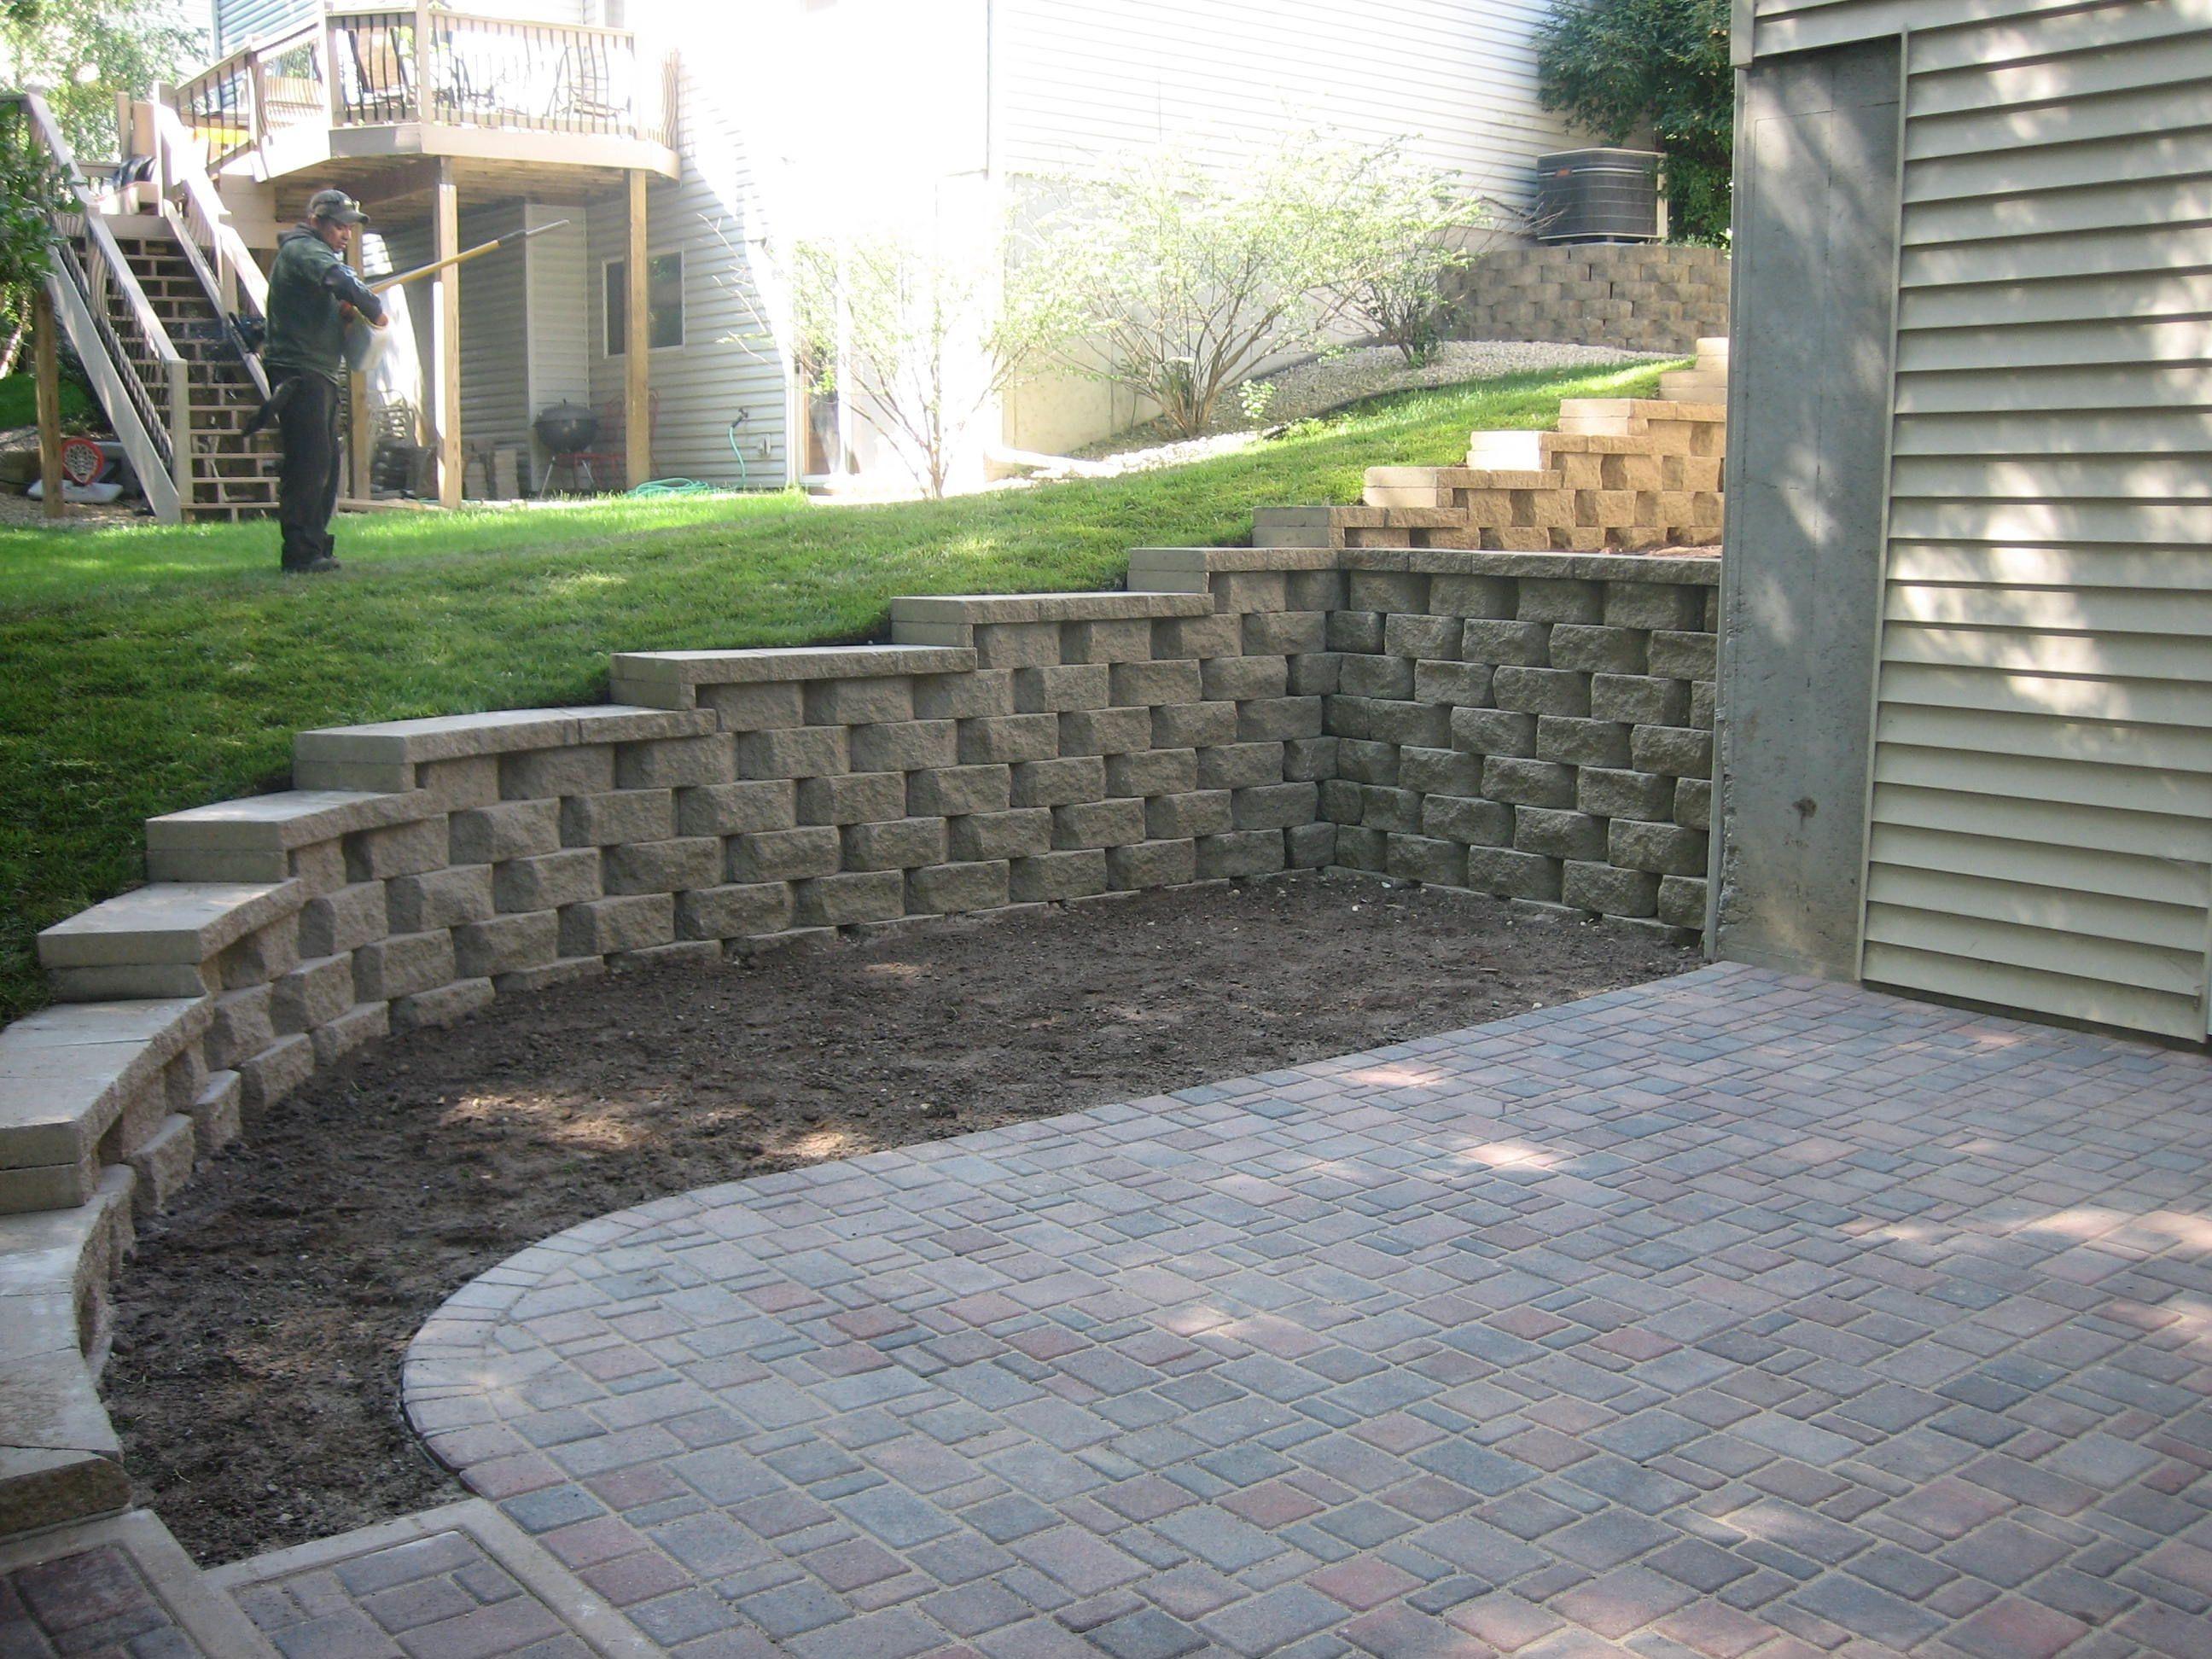 Pin By Marisa Bruce On Patio Ideas Backyard Retaining Walls Landscaping Retaining Walls Retaining Wall Patio